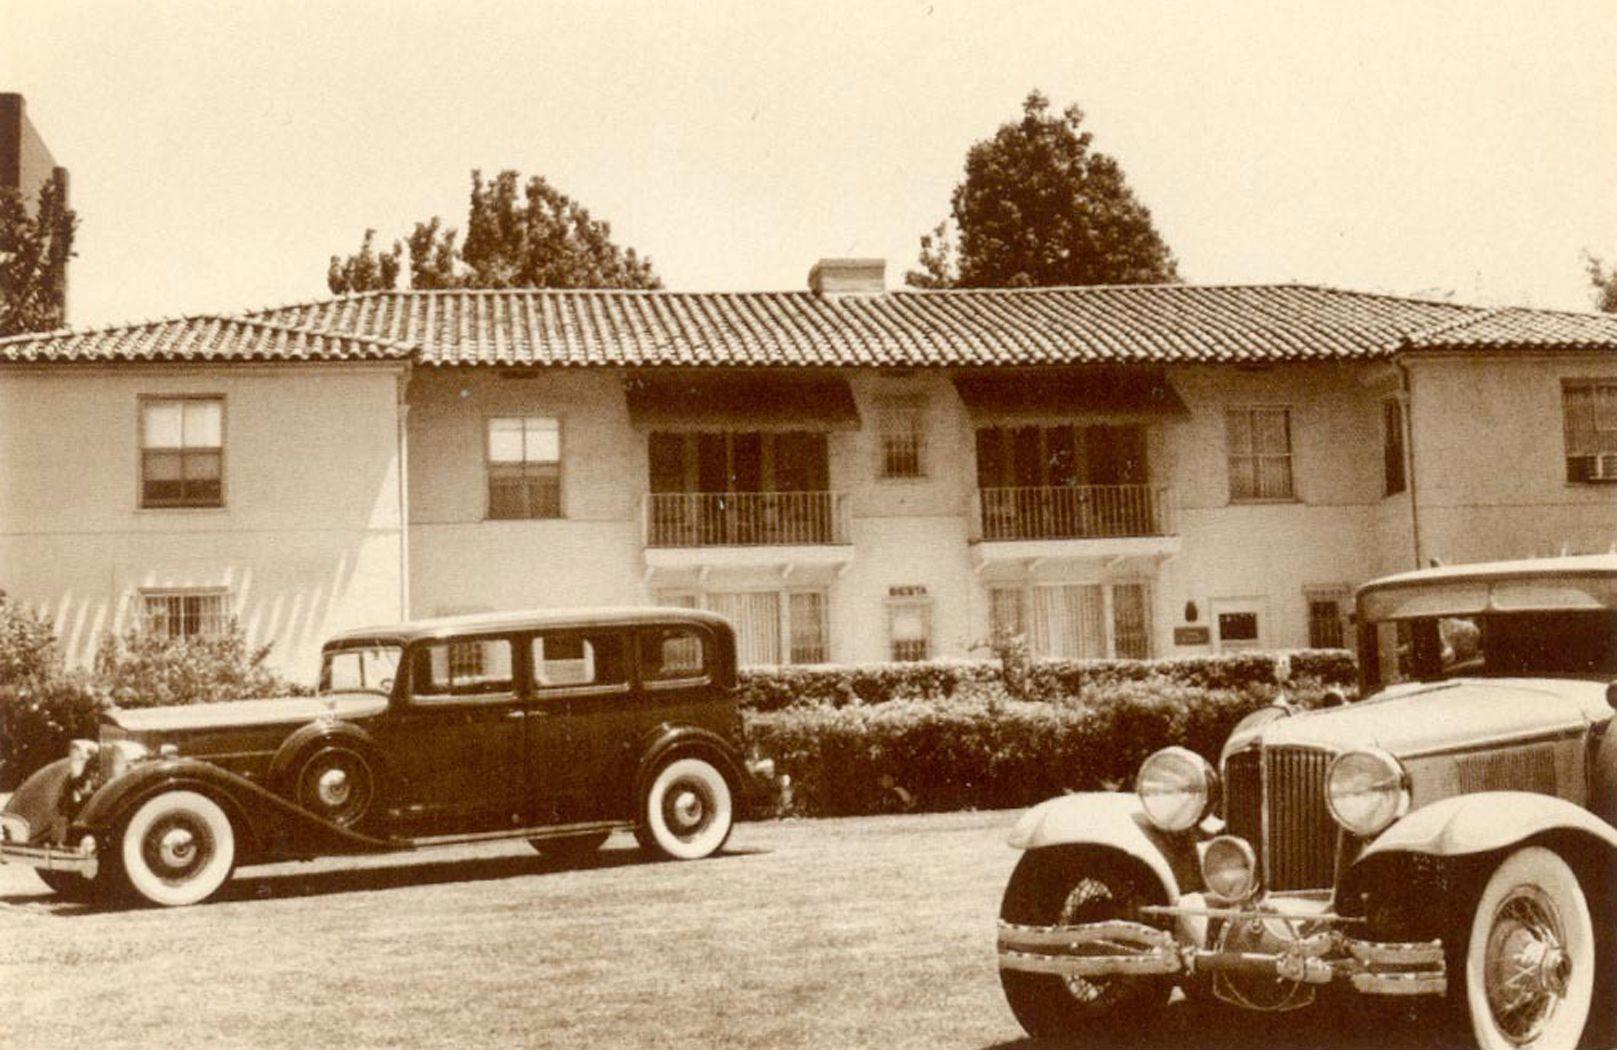 Ambassador Hotel Los Angeles Bungalow